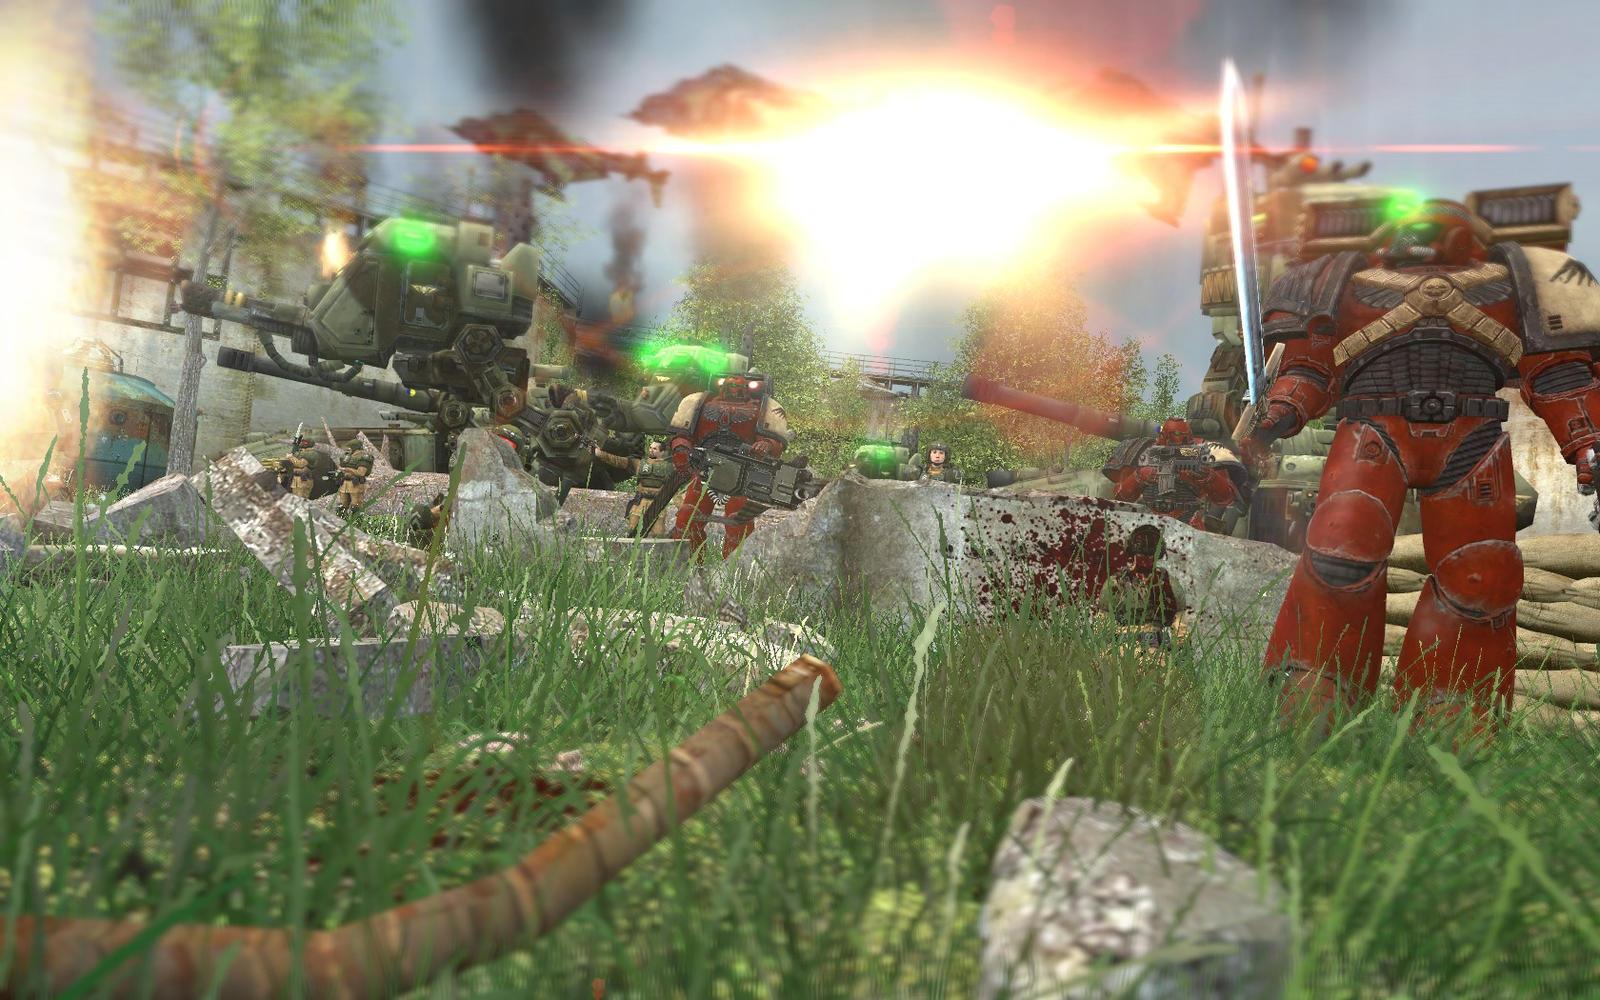 Warhammer 40k Imperial Guard by Rodzyniasty on DeviantArt